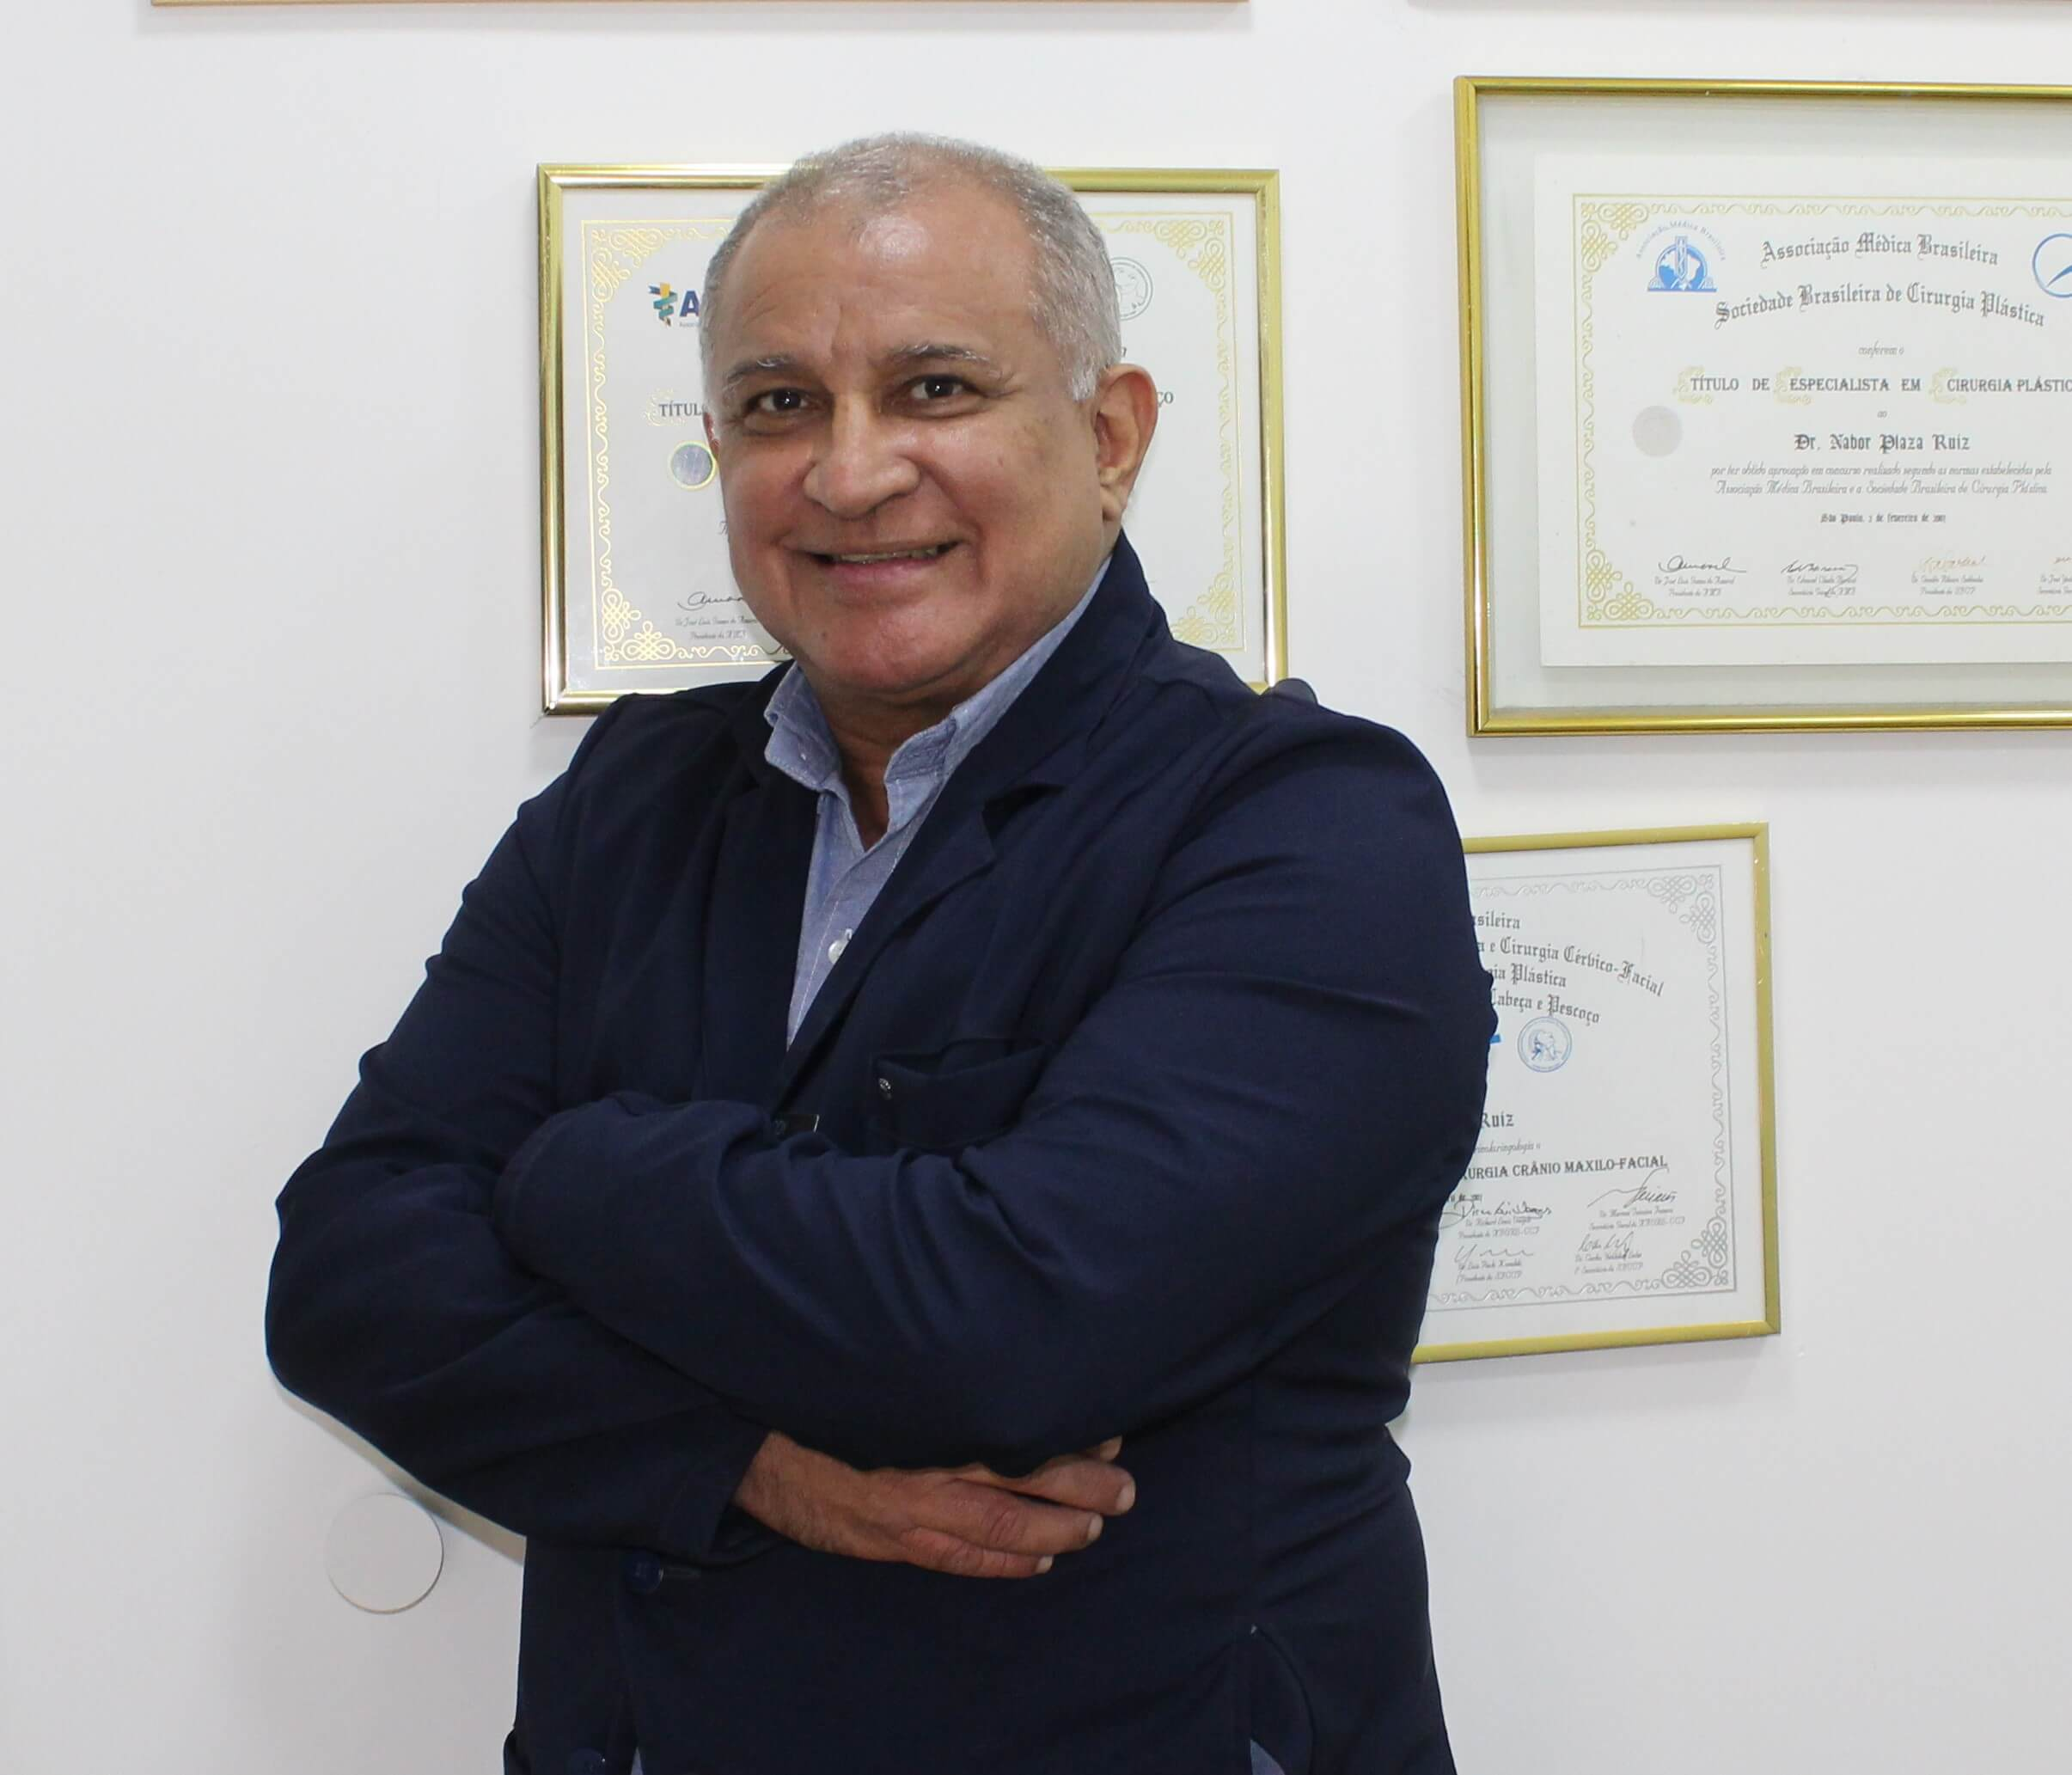 Dr. Nabor Plaza